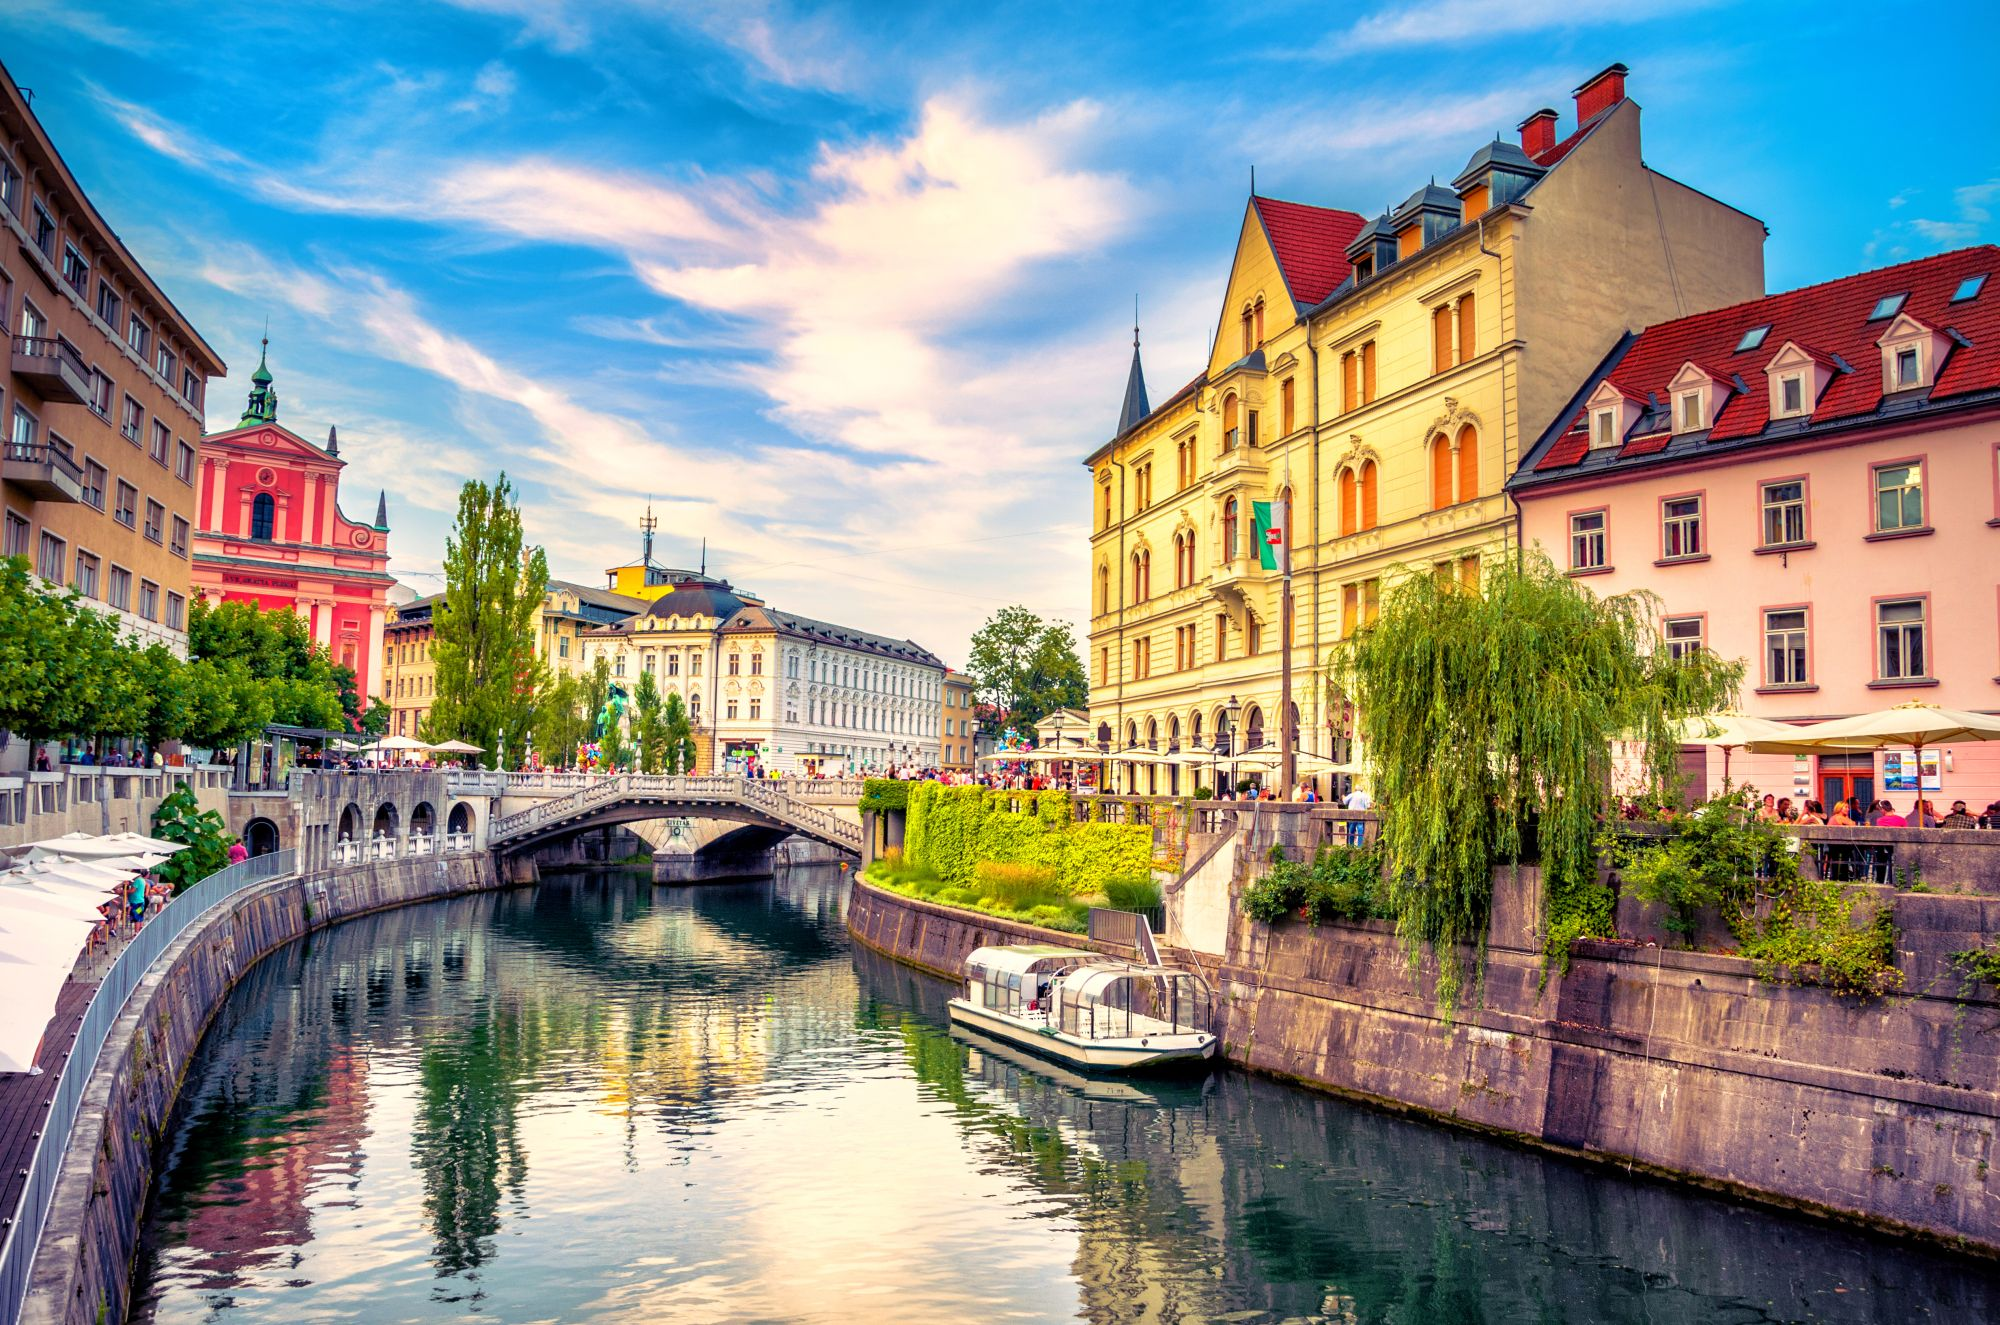 Lublana widok miasta